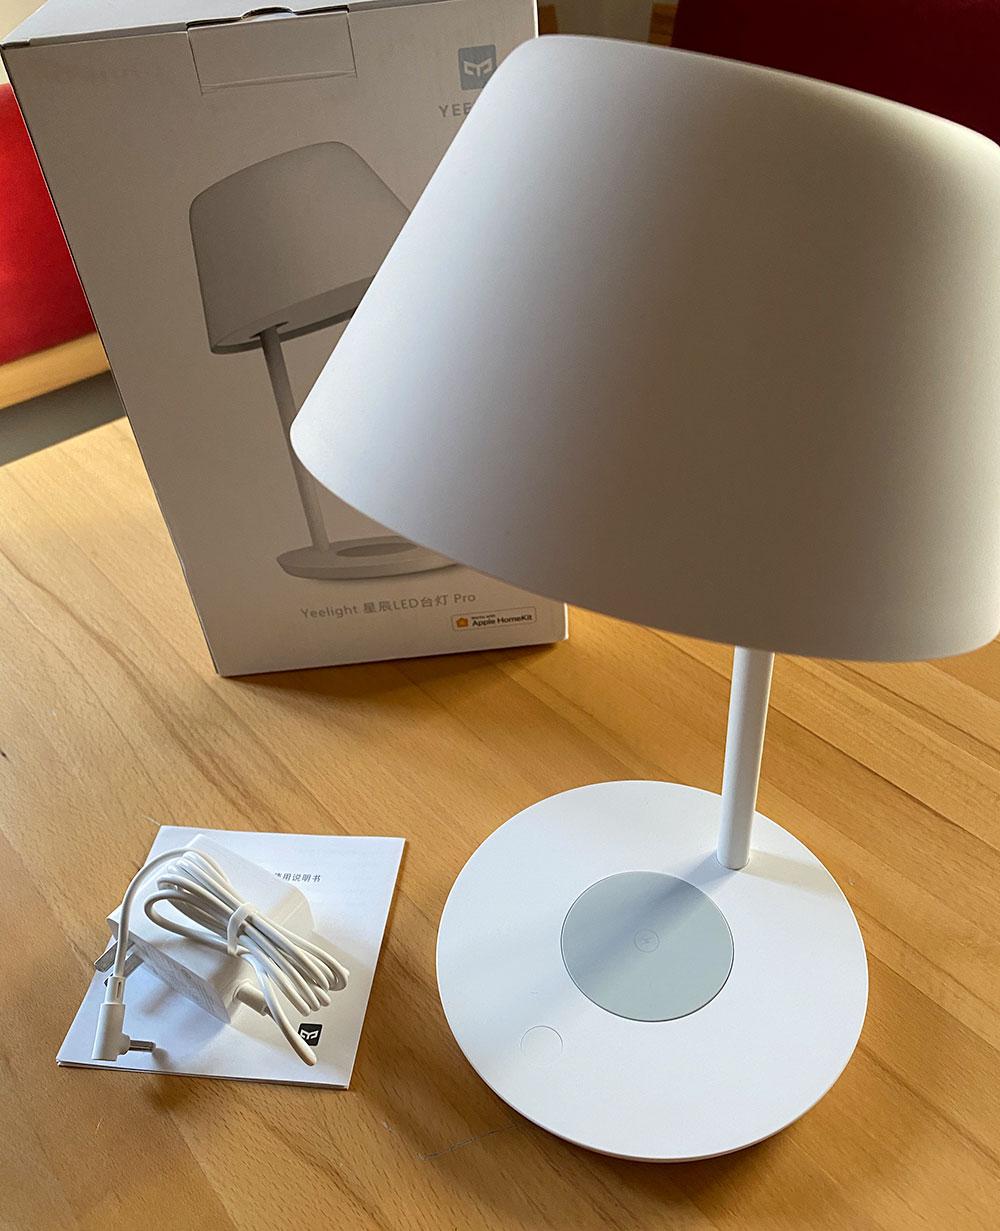 Yeelight Led Table Lamp Pro Lieferumfang